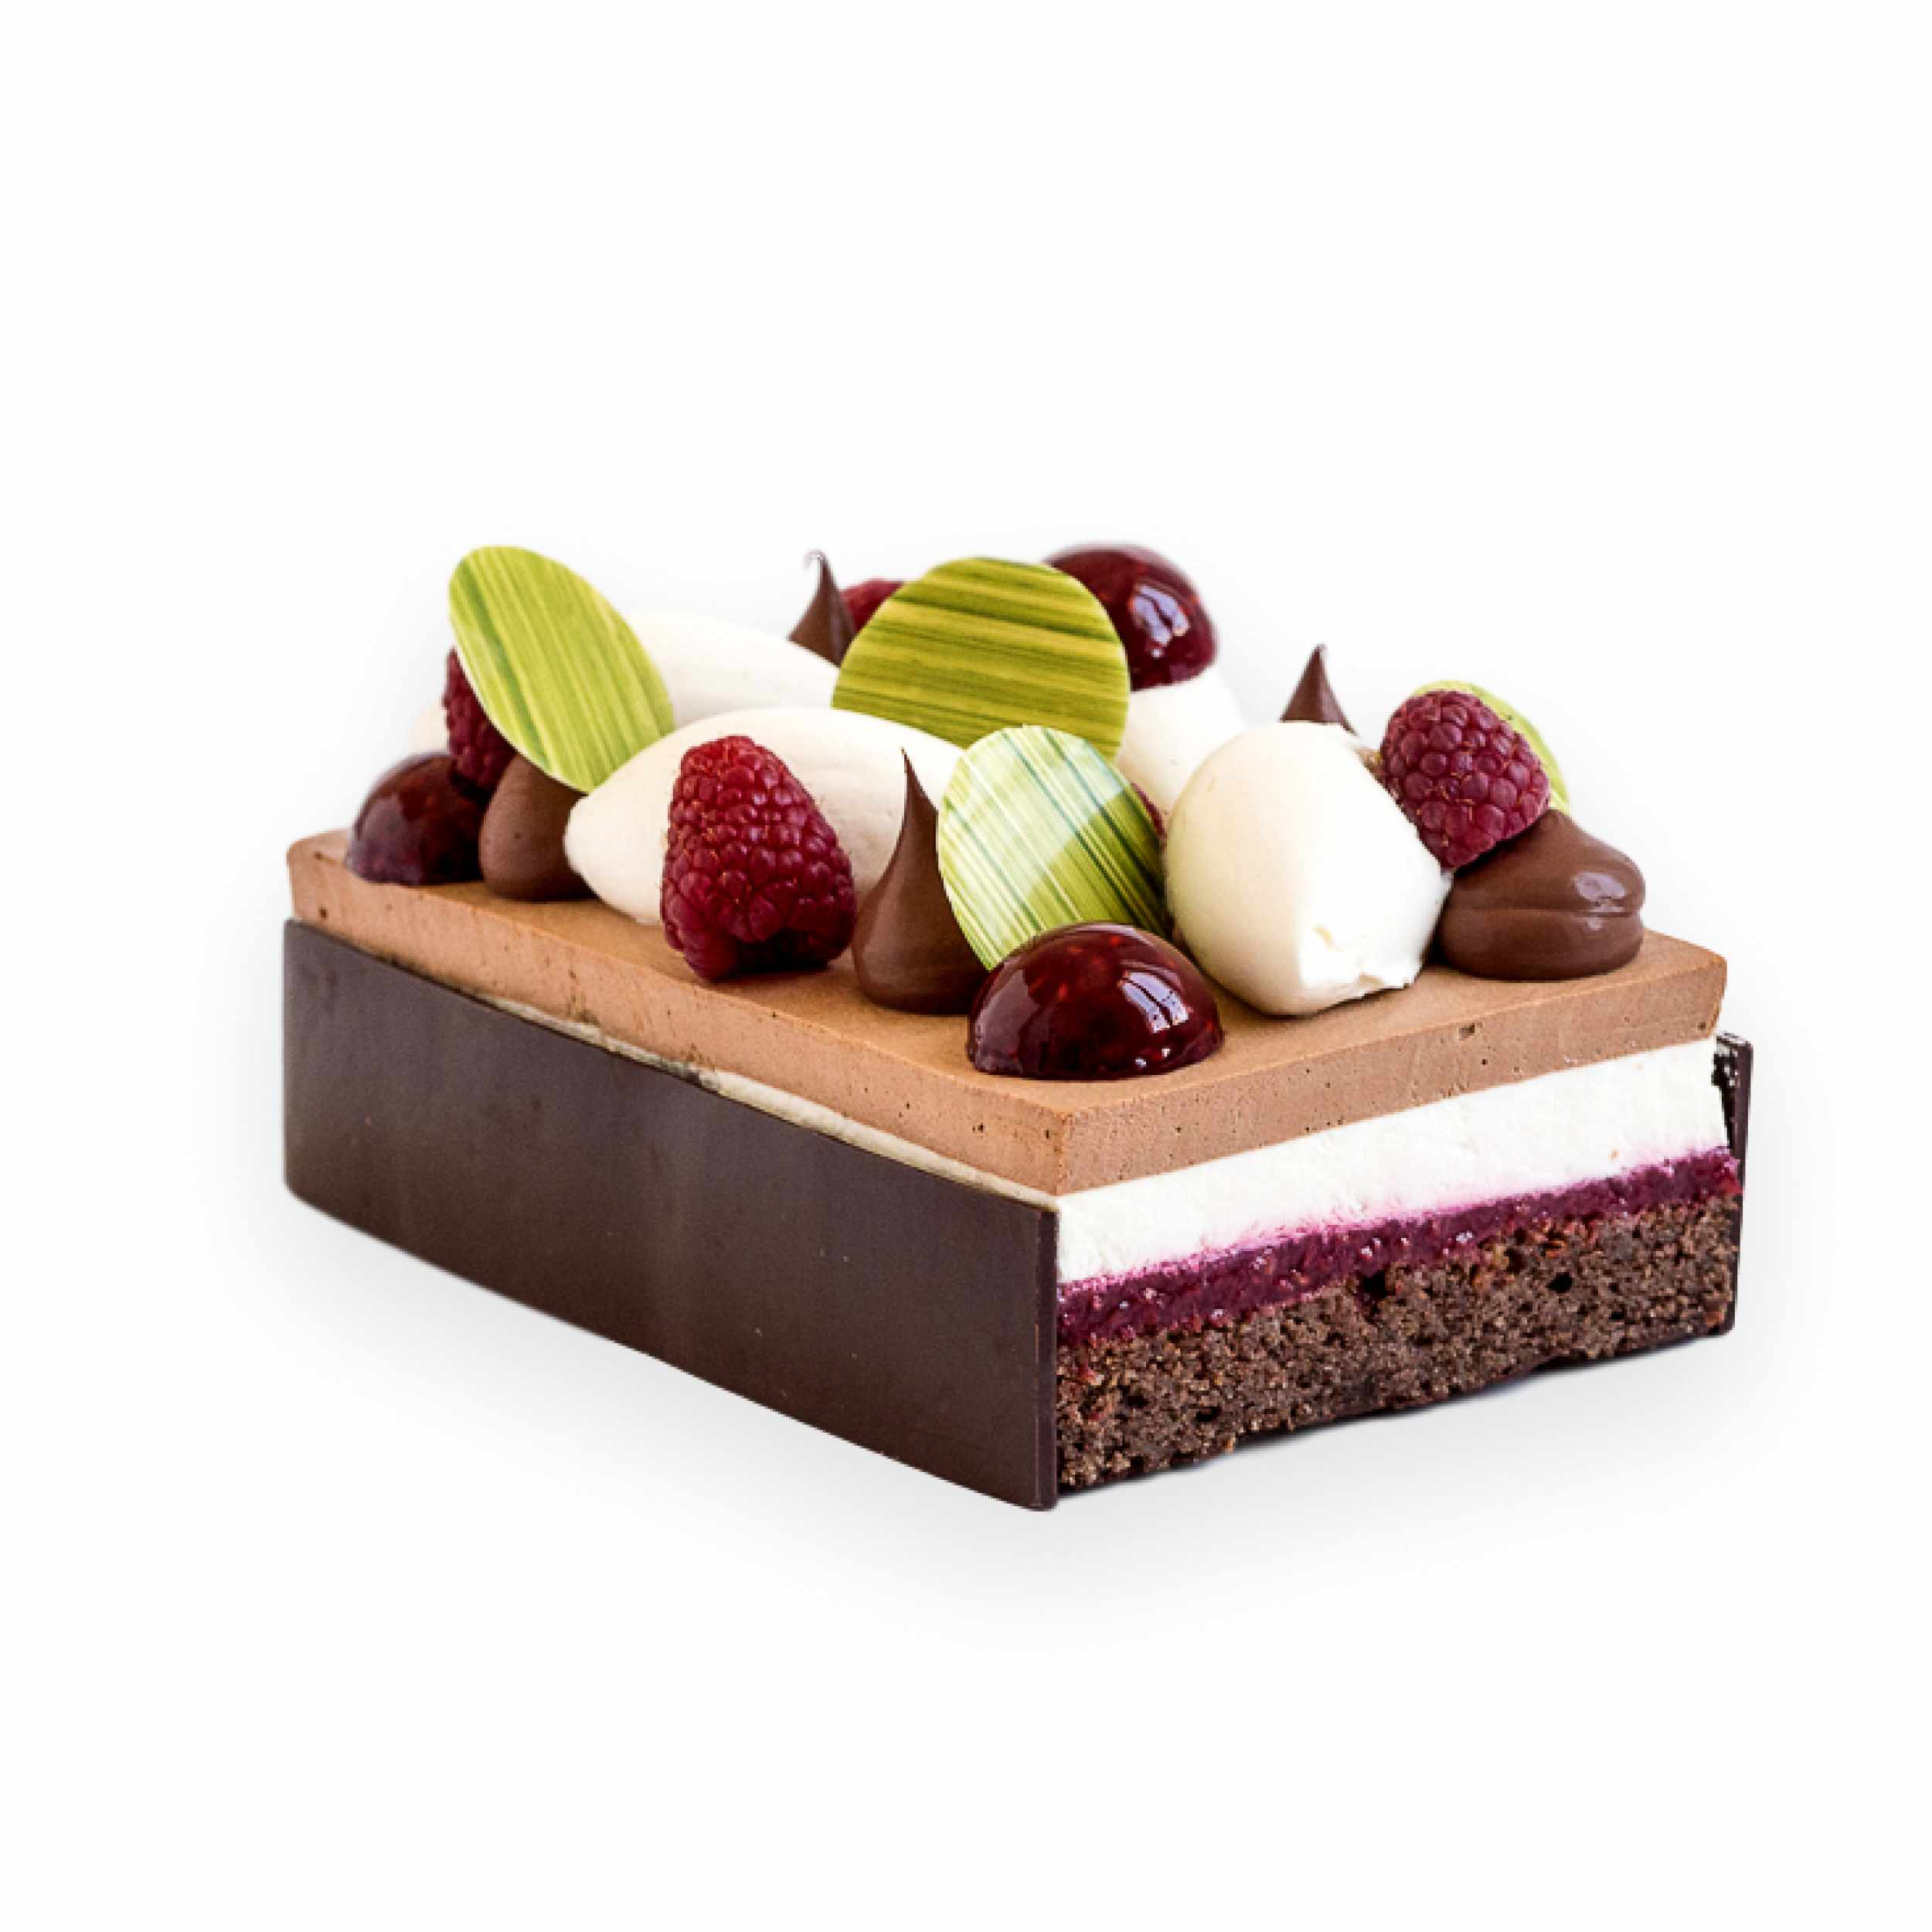 entremets-chocolat-vanille-framboise.jpg